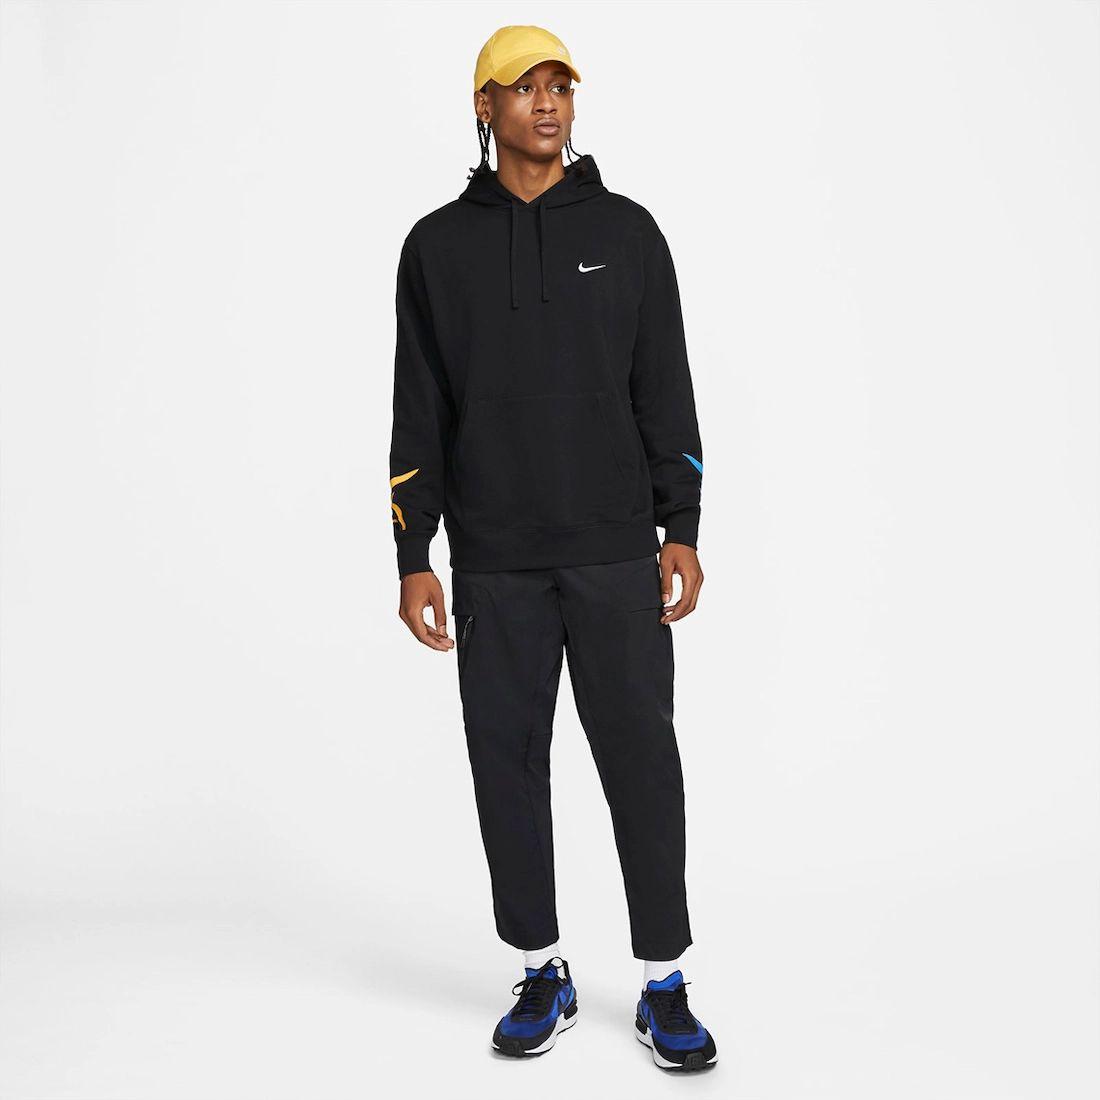 Nike,Air Force 1,Blazer Mid,Ai  一口气出三双!全新 Nike 摔角面具主题球鞋即将发售!